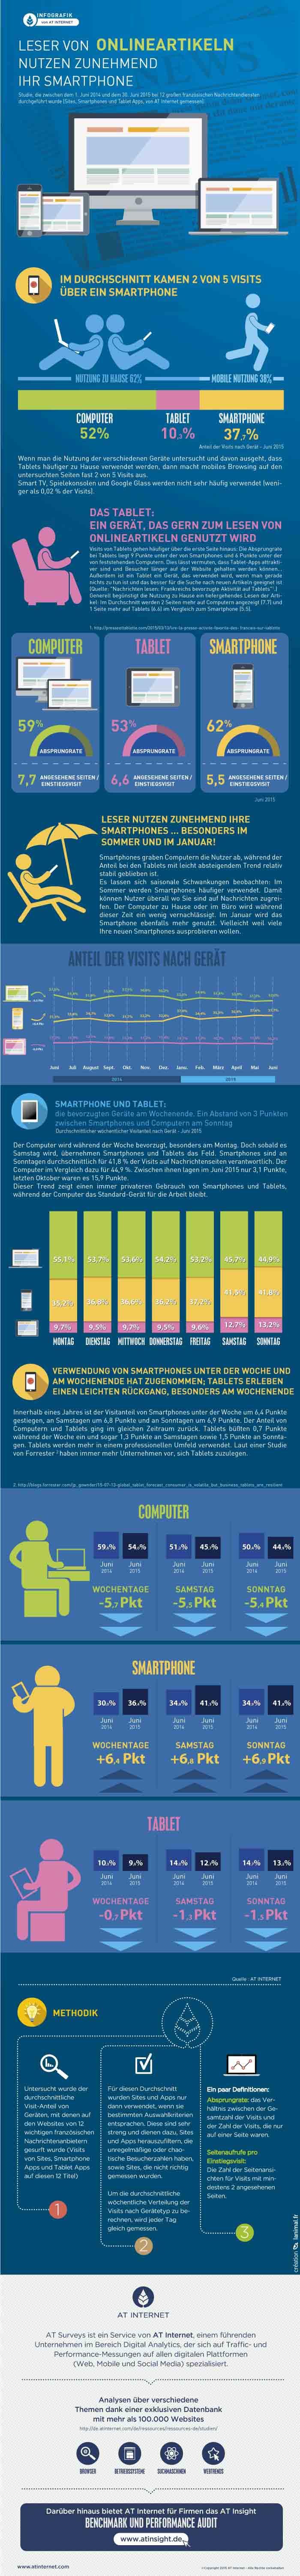 Infographic_PressDevice_Juni2015